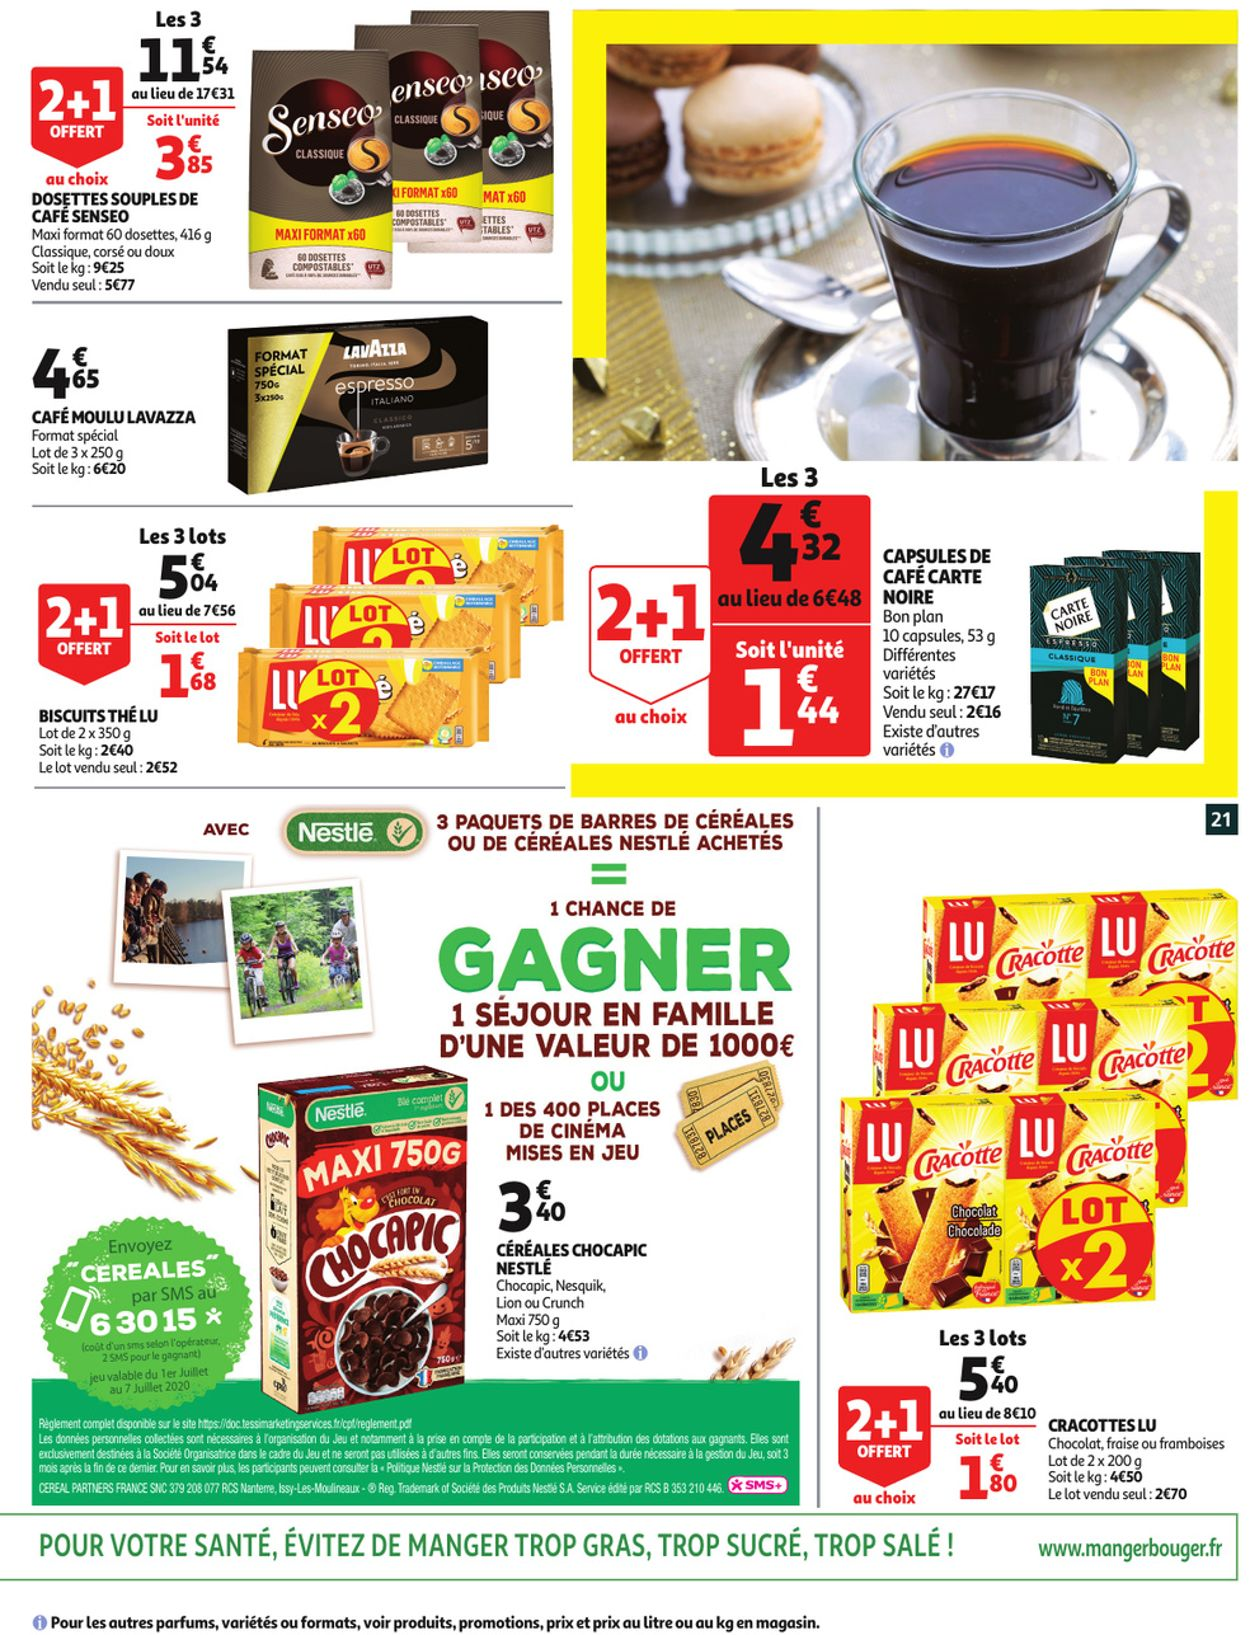 Auchan Catalogue - 01.07-07.07.2020 (Page 21)